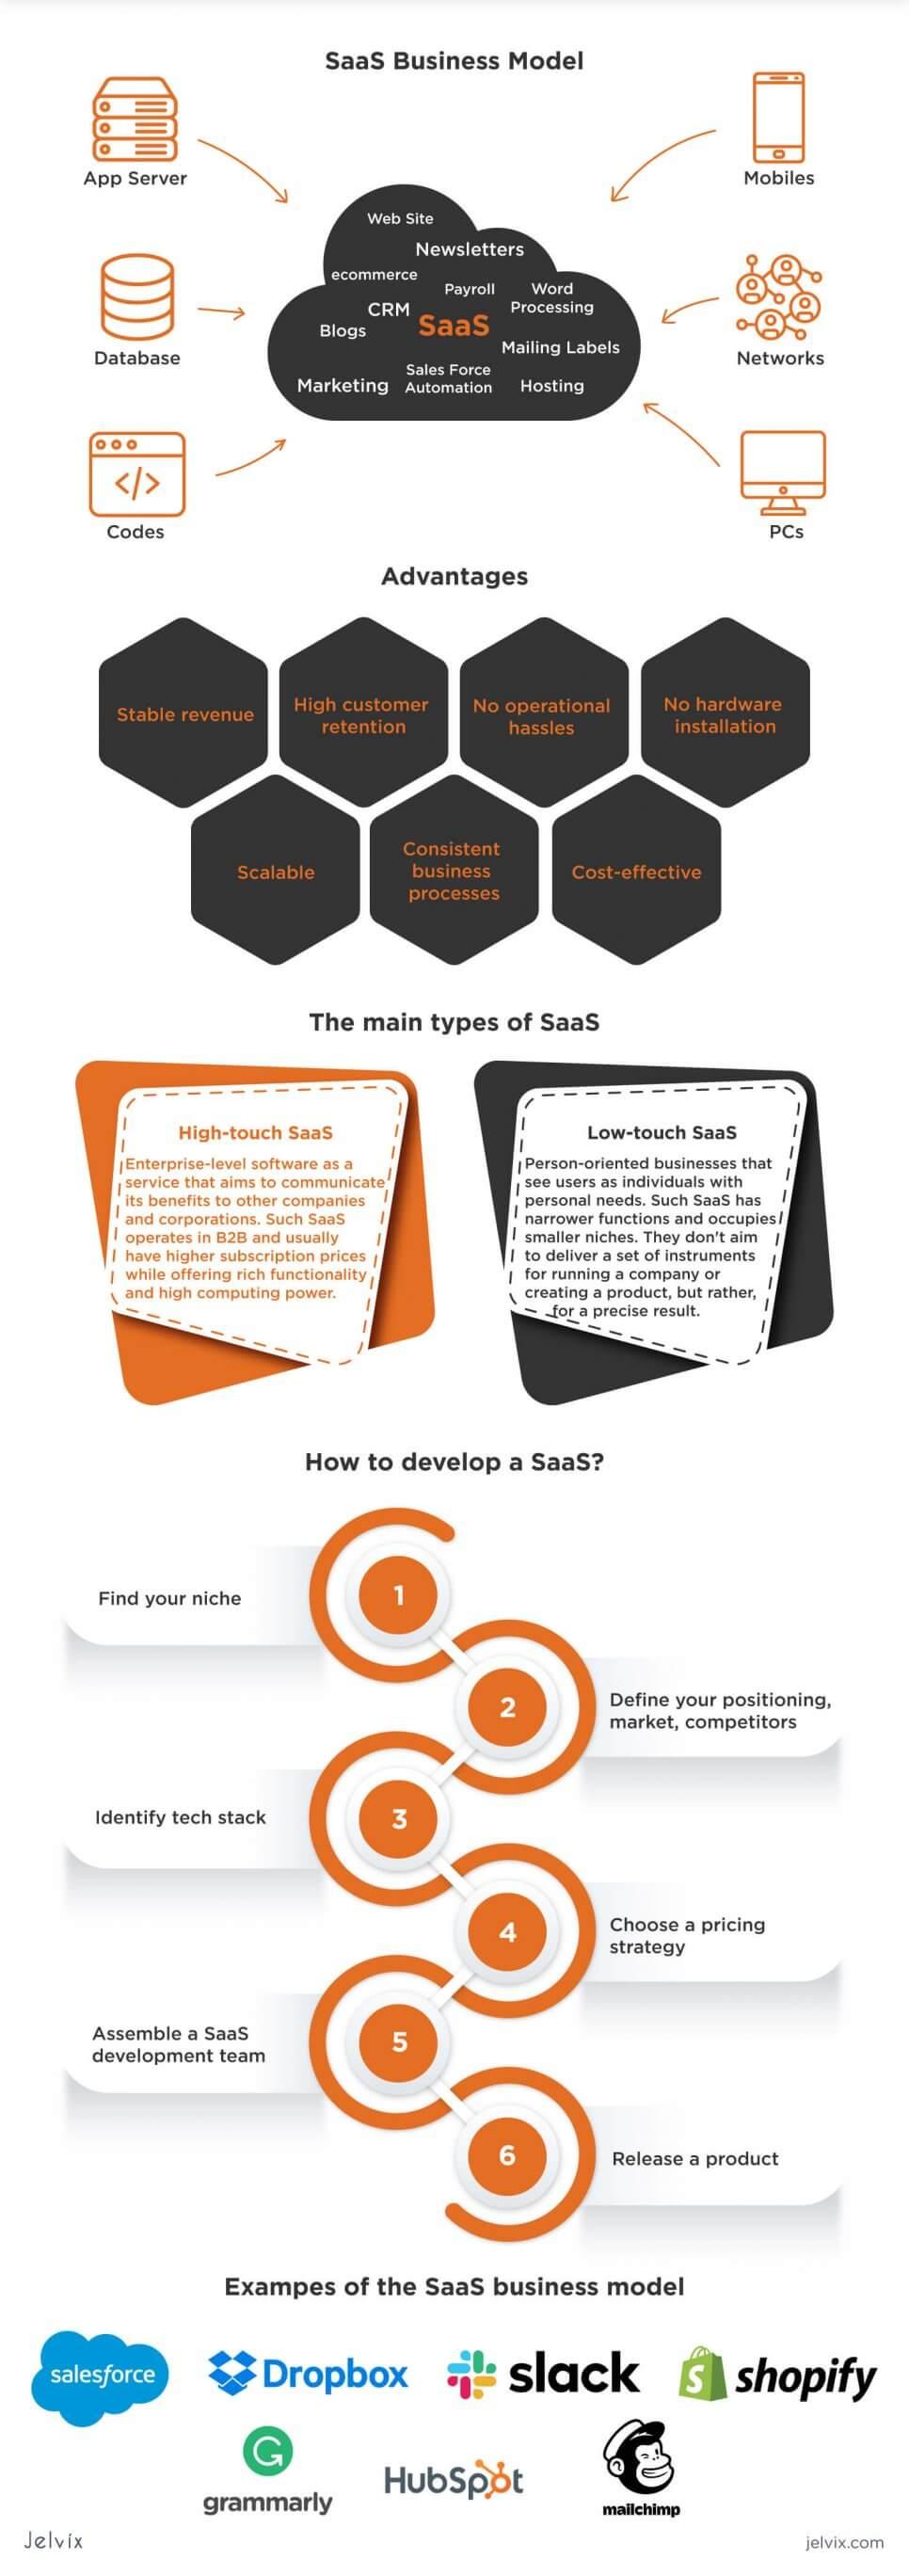 Saas model infographic